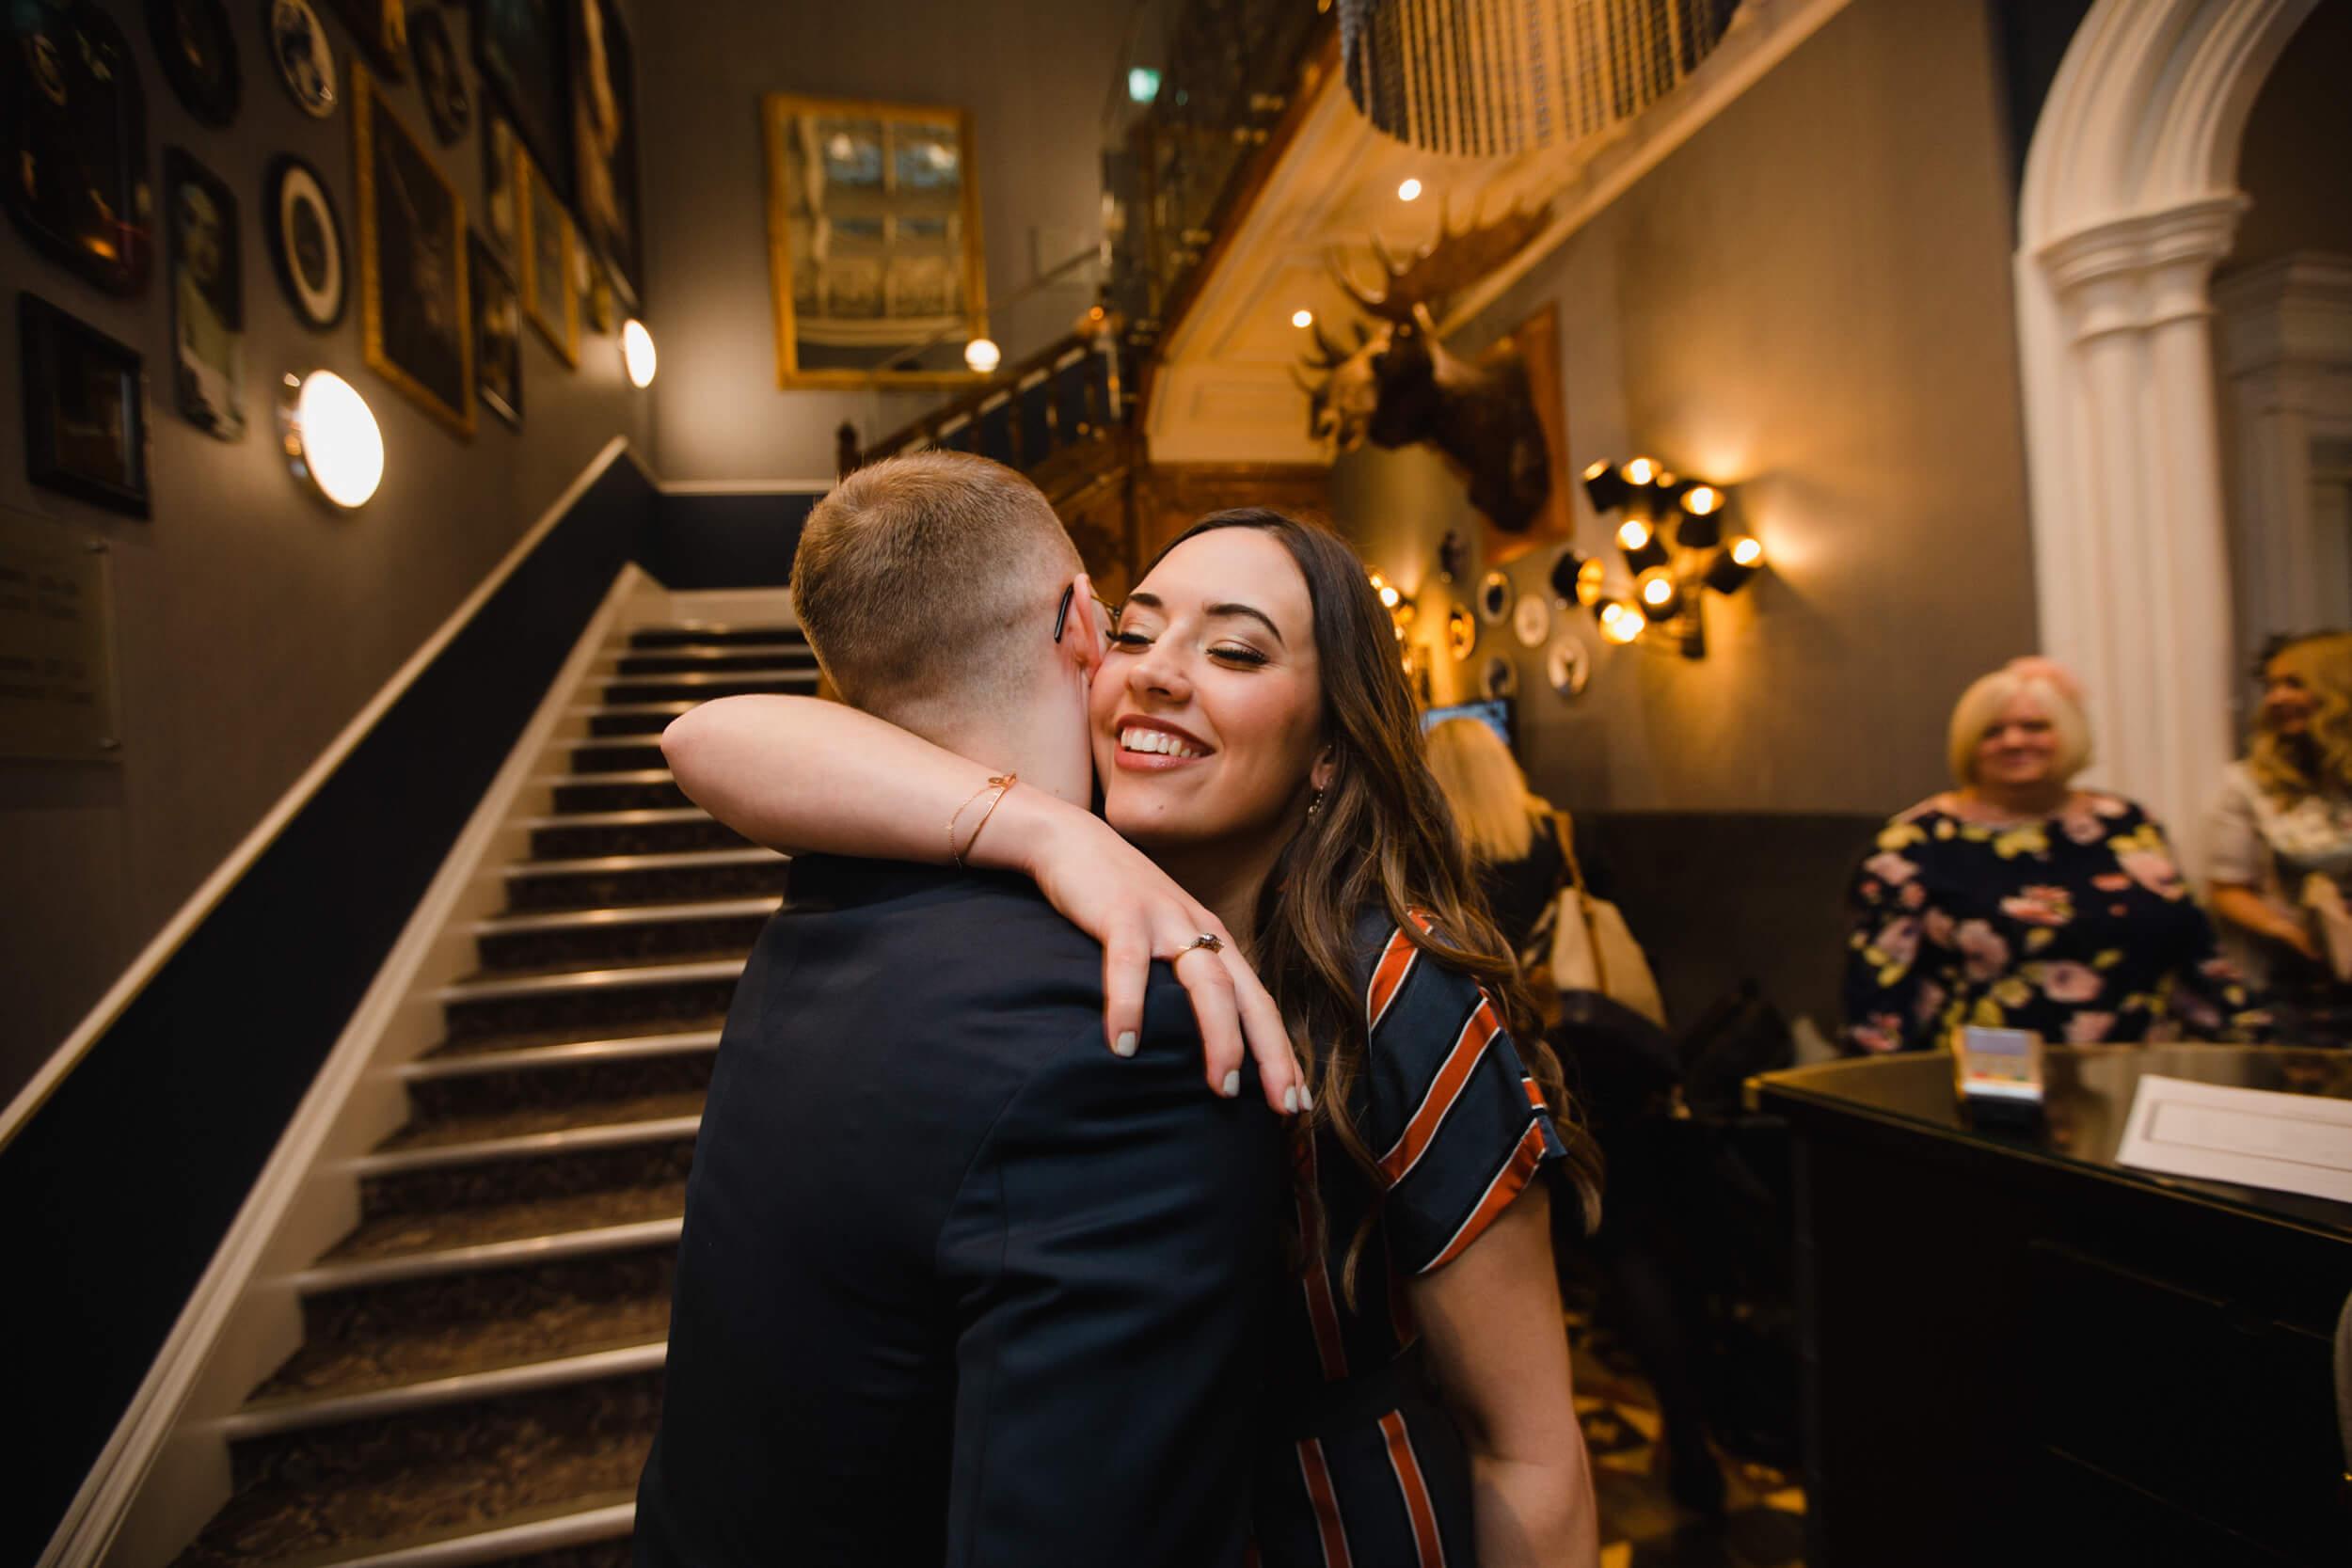 wedding guest sharing hug with groom before wedding ceremony